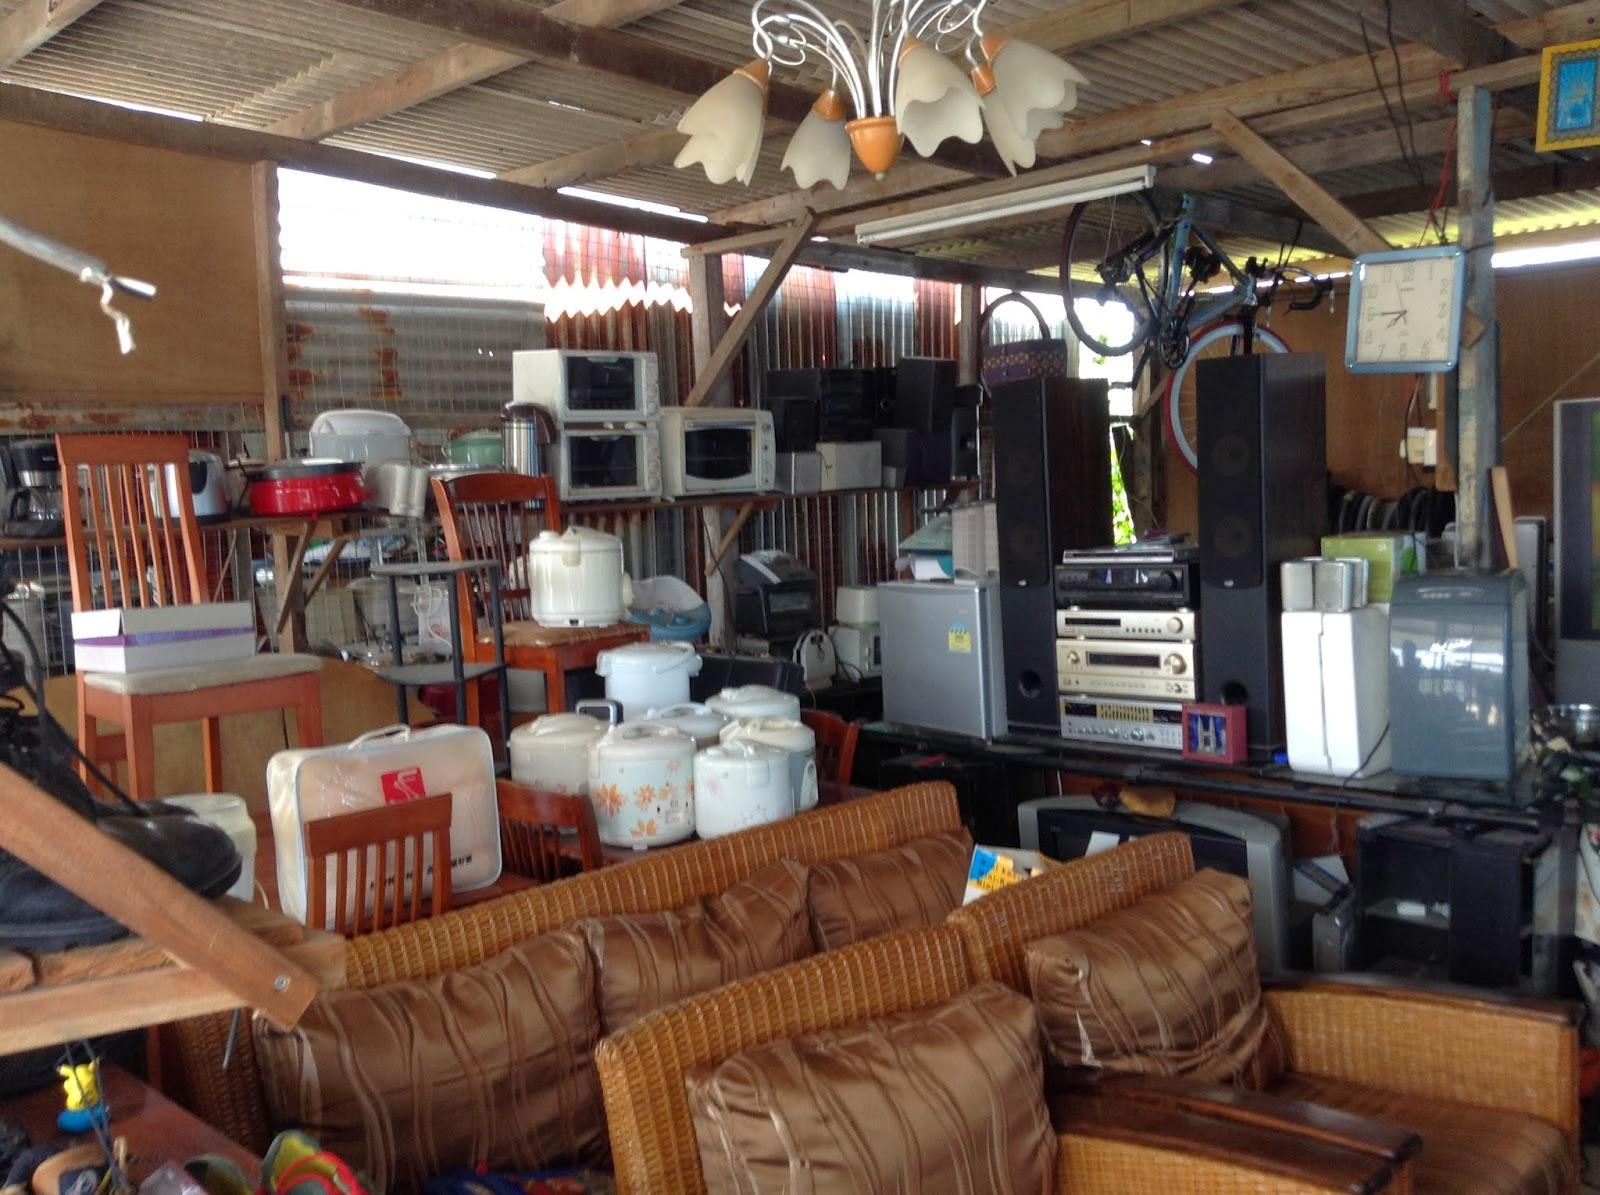 Kedai Perabot Murah Sungai Buloh Desainrumahid